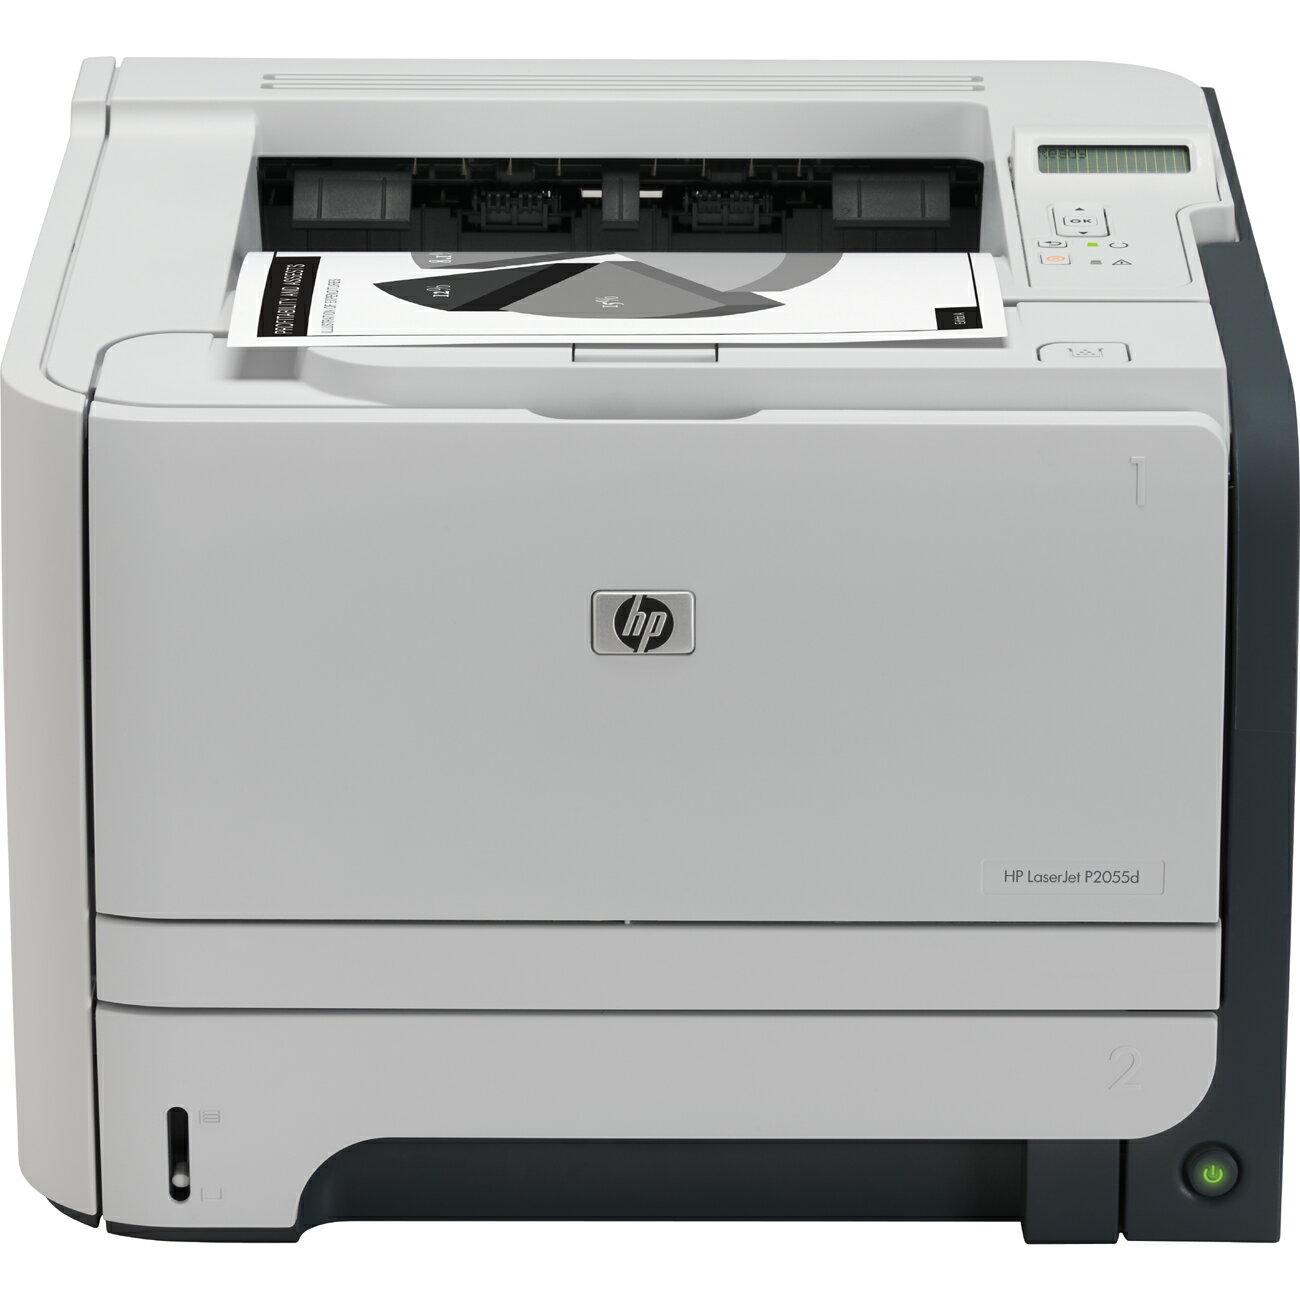 HP LaserJet P2055d Monochrome Laser Printer 0